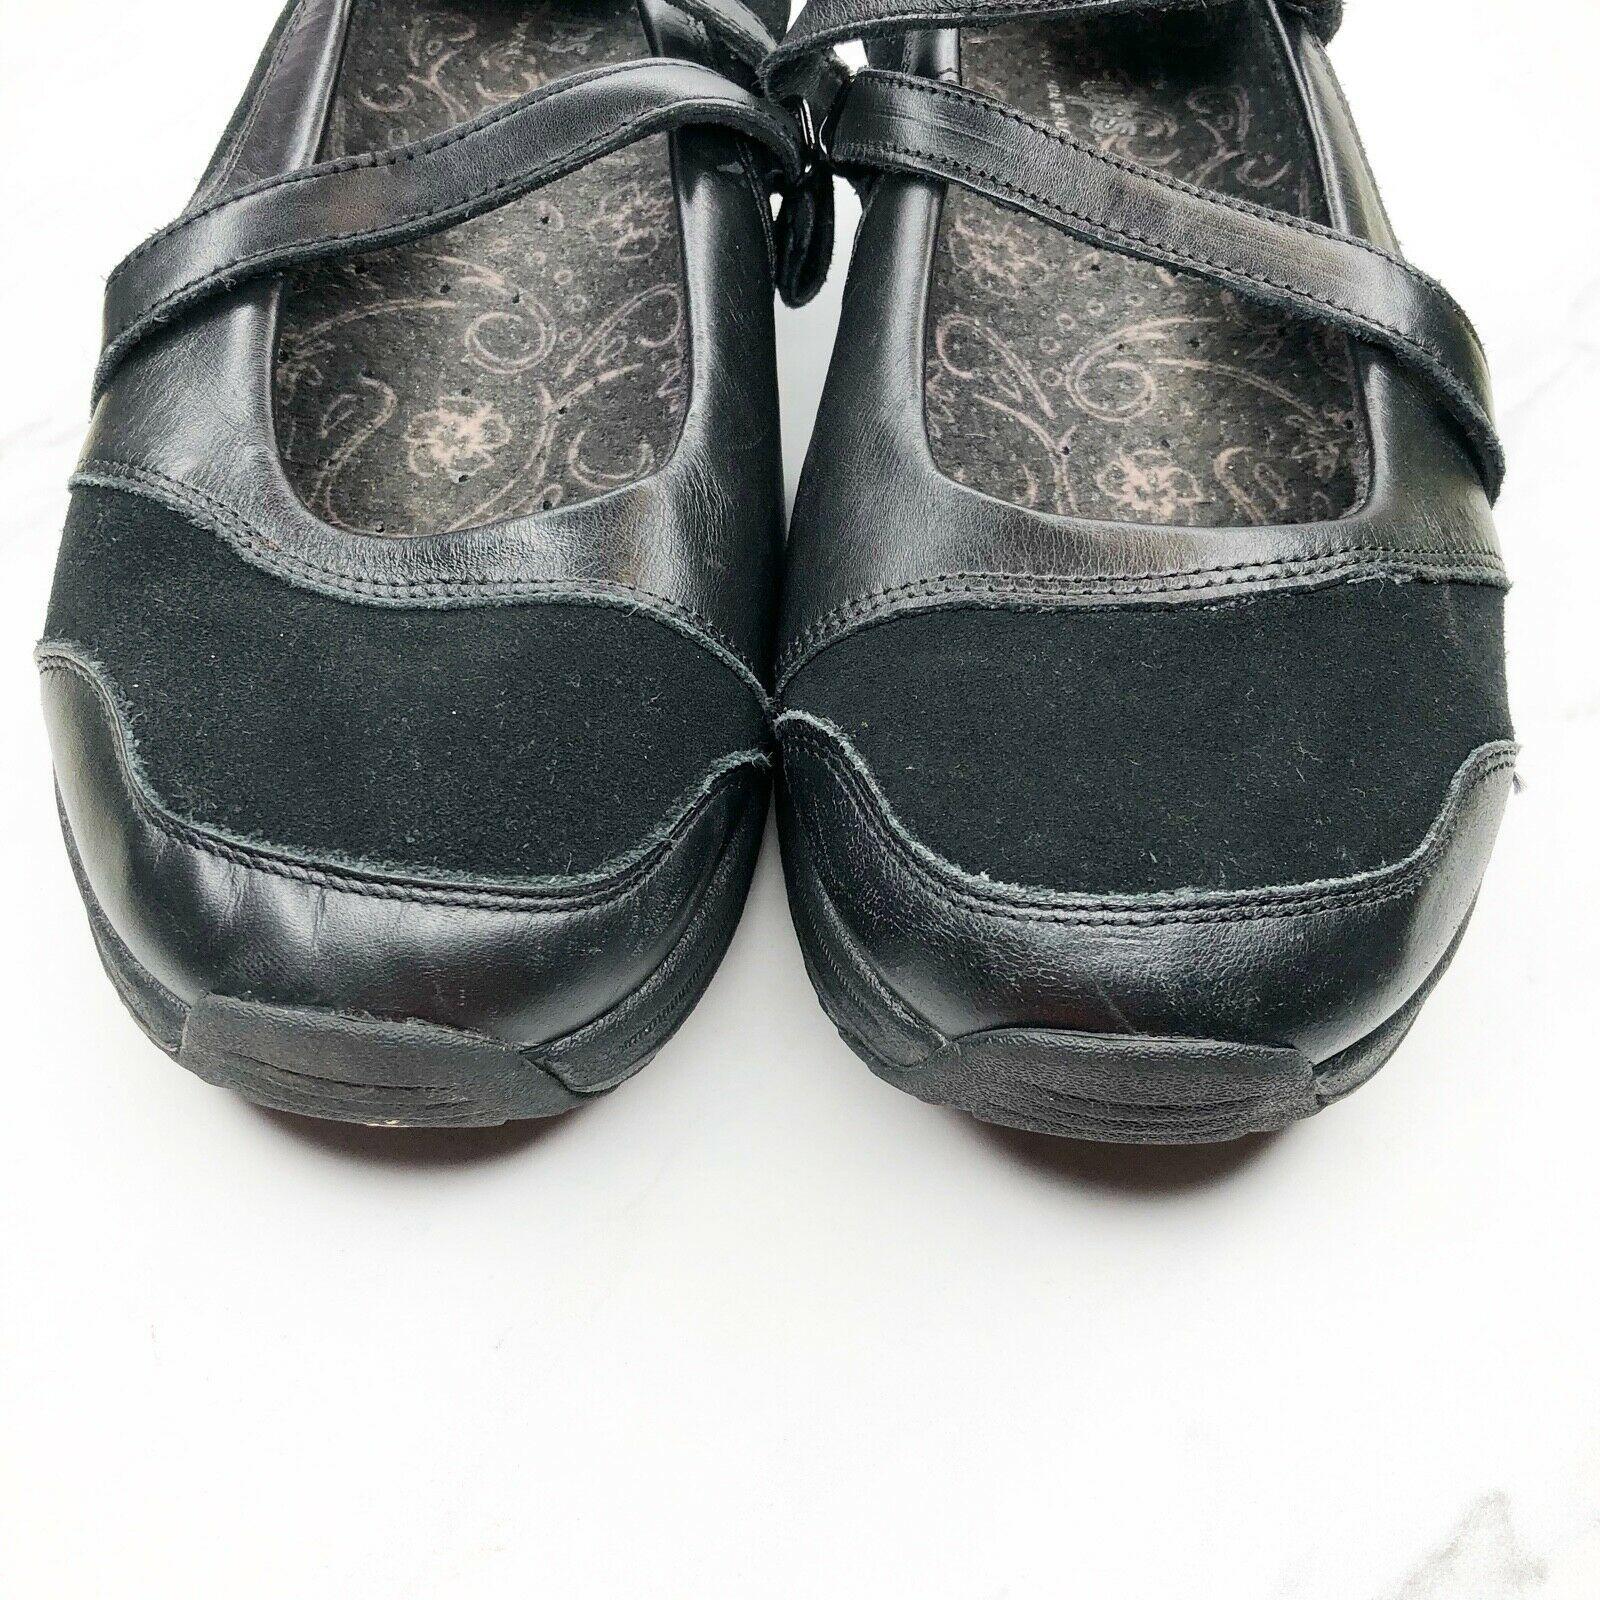 Skechers Shape Ups Mary Jane 7.5 Black Shoes Womens Sneakers Toning Rocker image 3